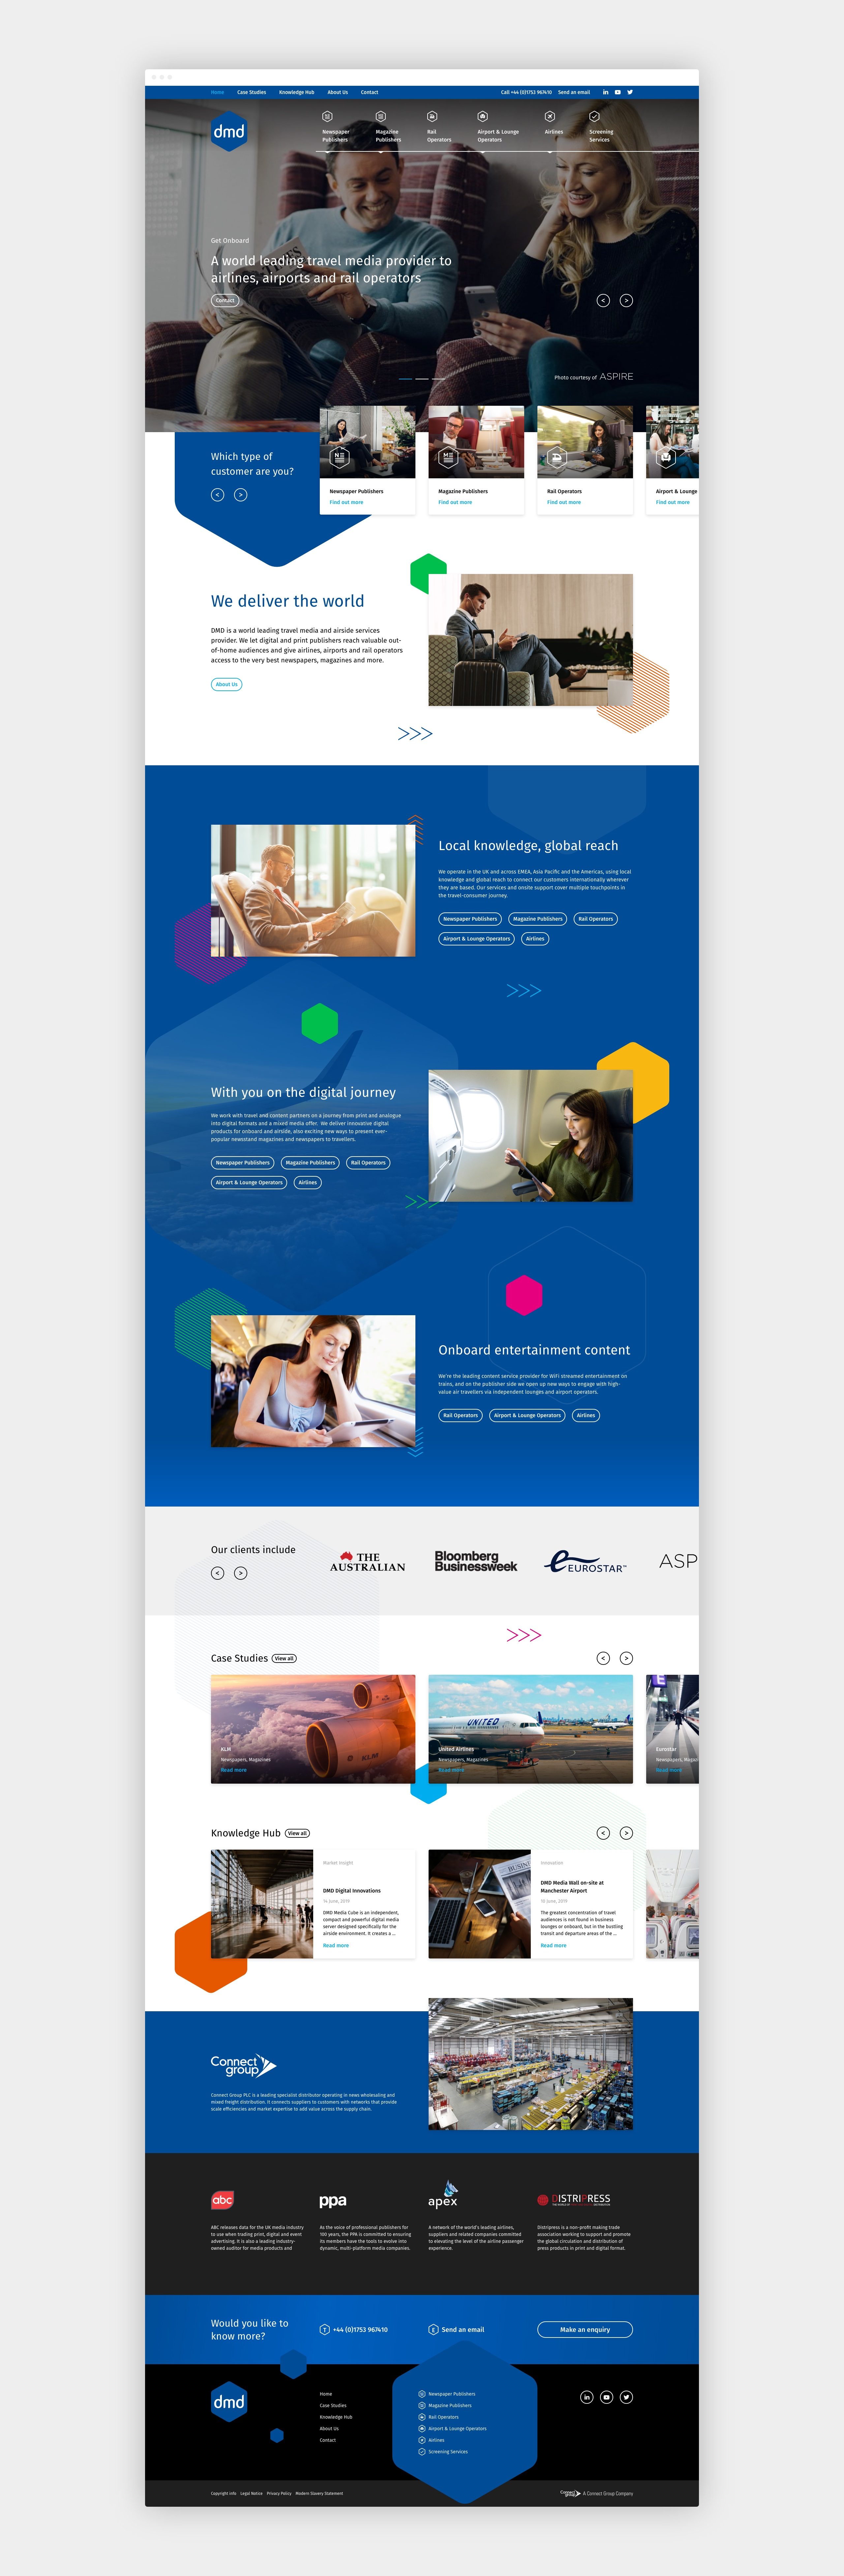 DMD responsive parallax website design